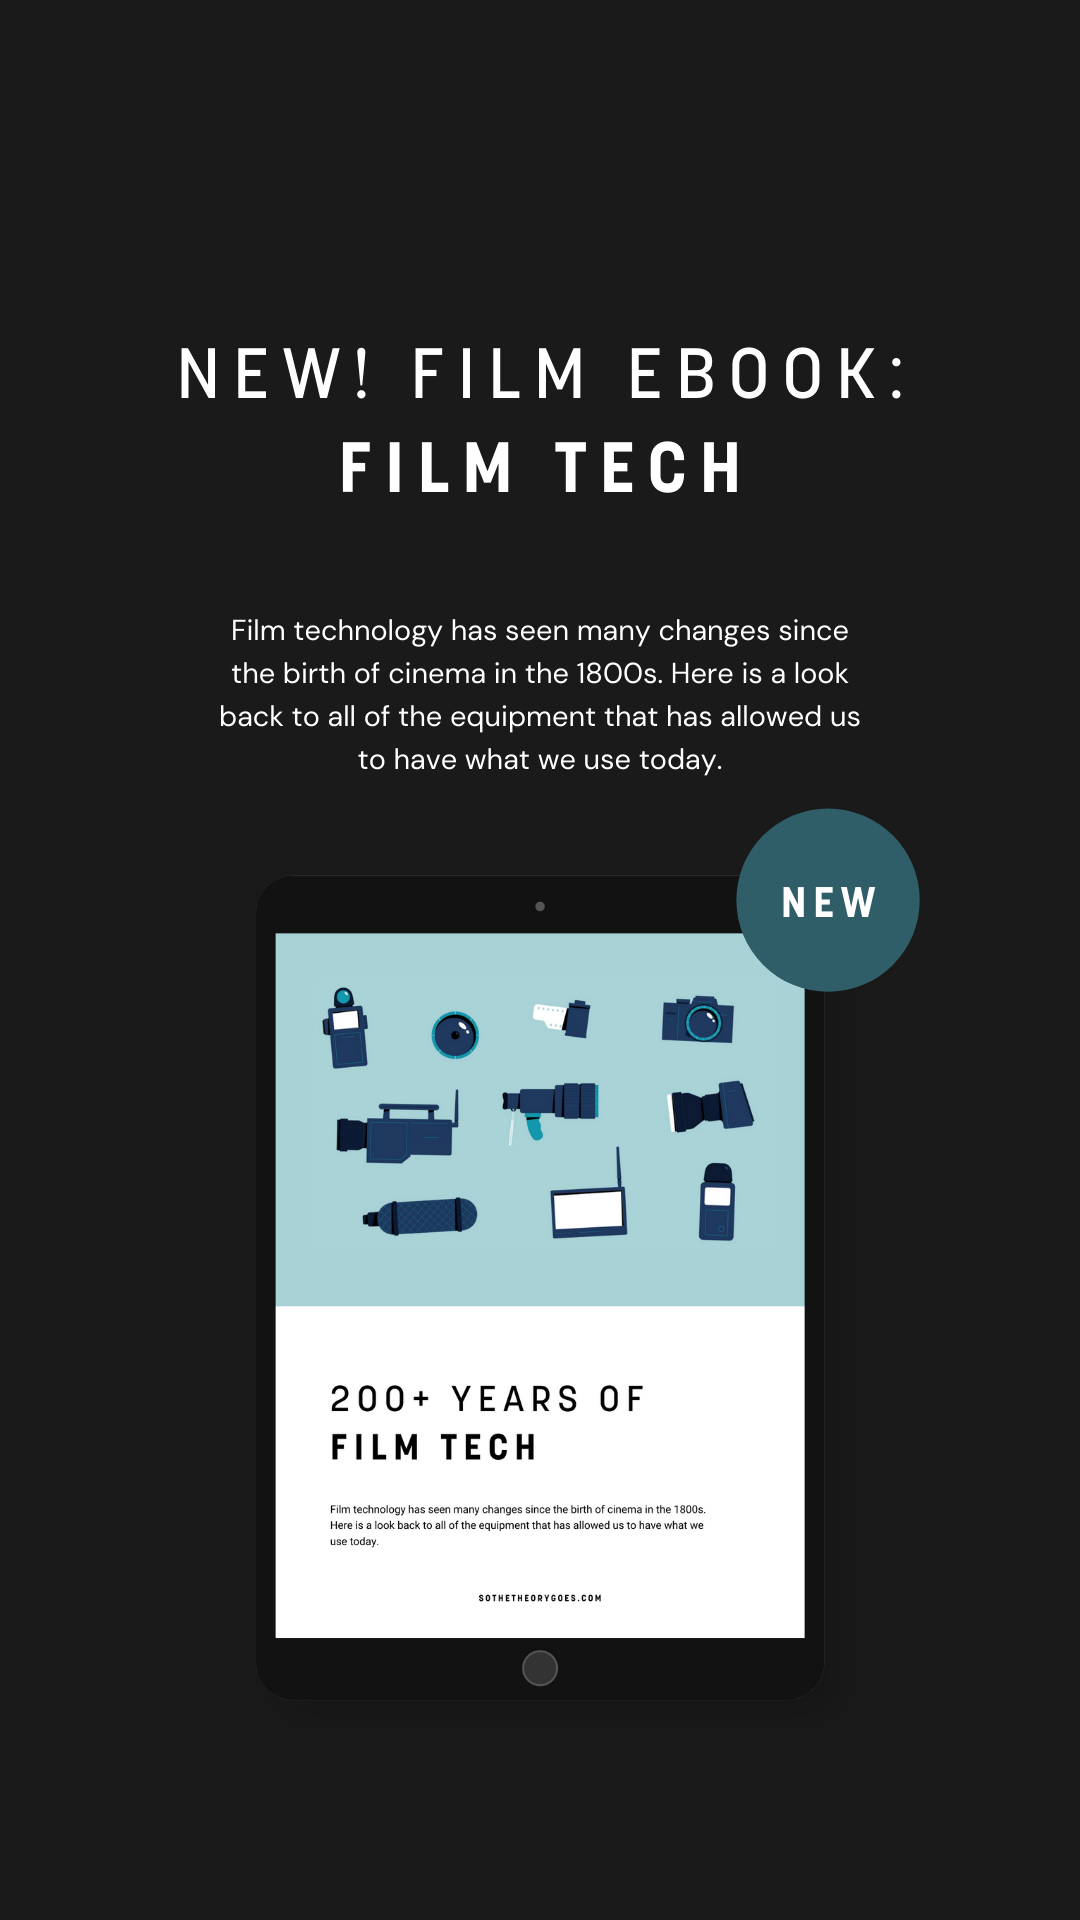 200 Years of Film Tech